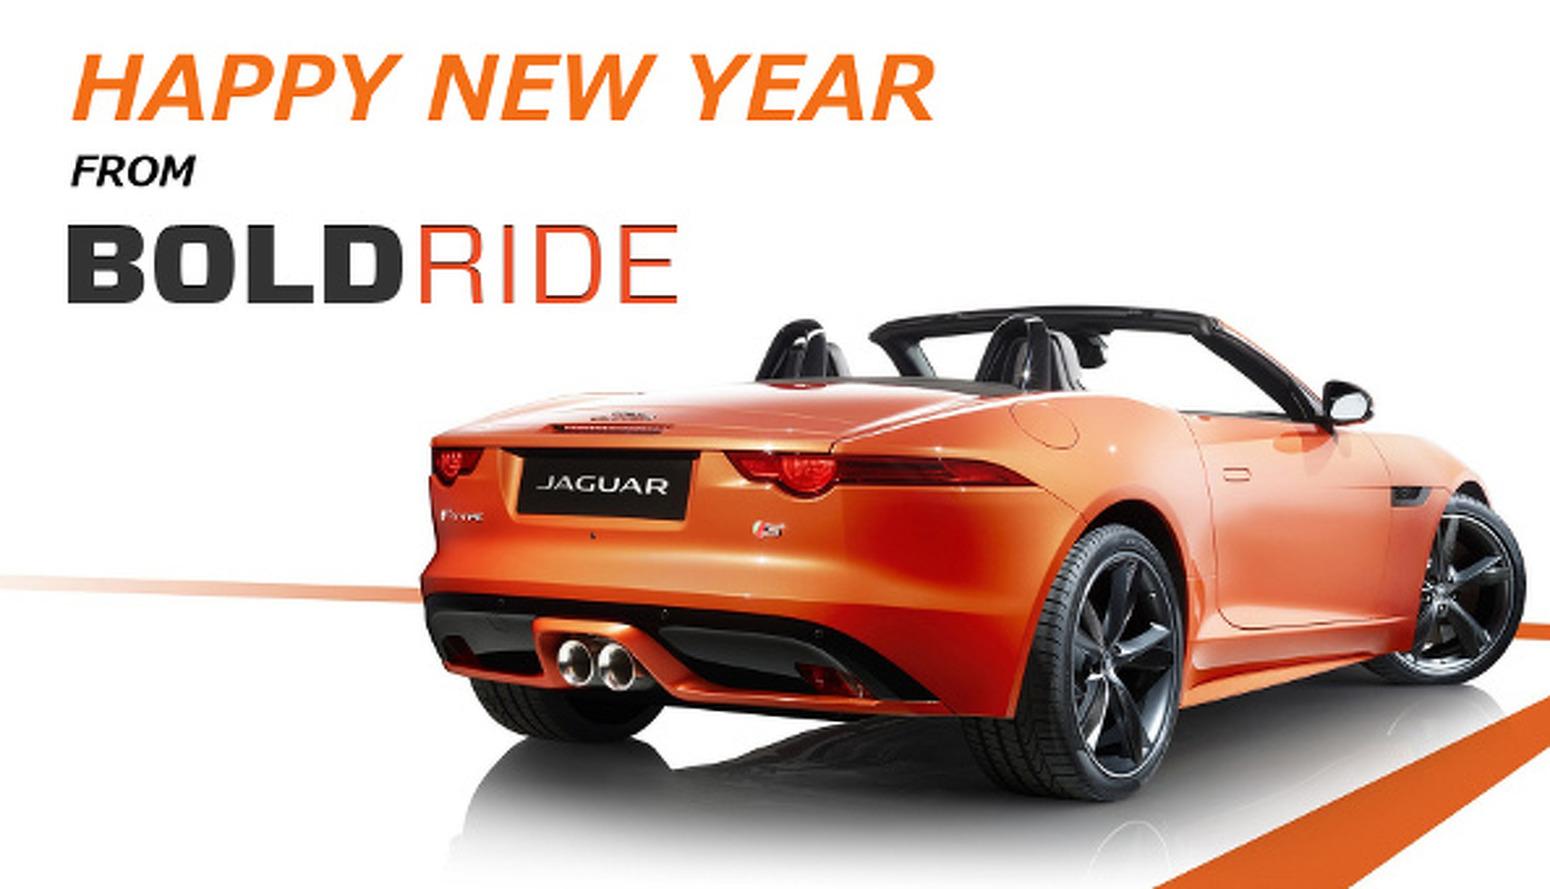 Happy New Year from BoldRide!